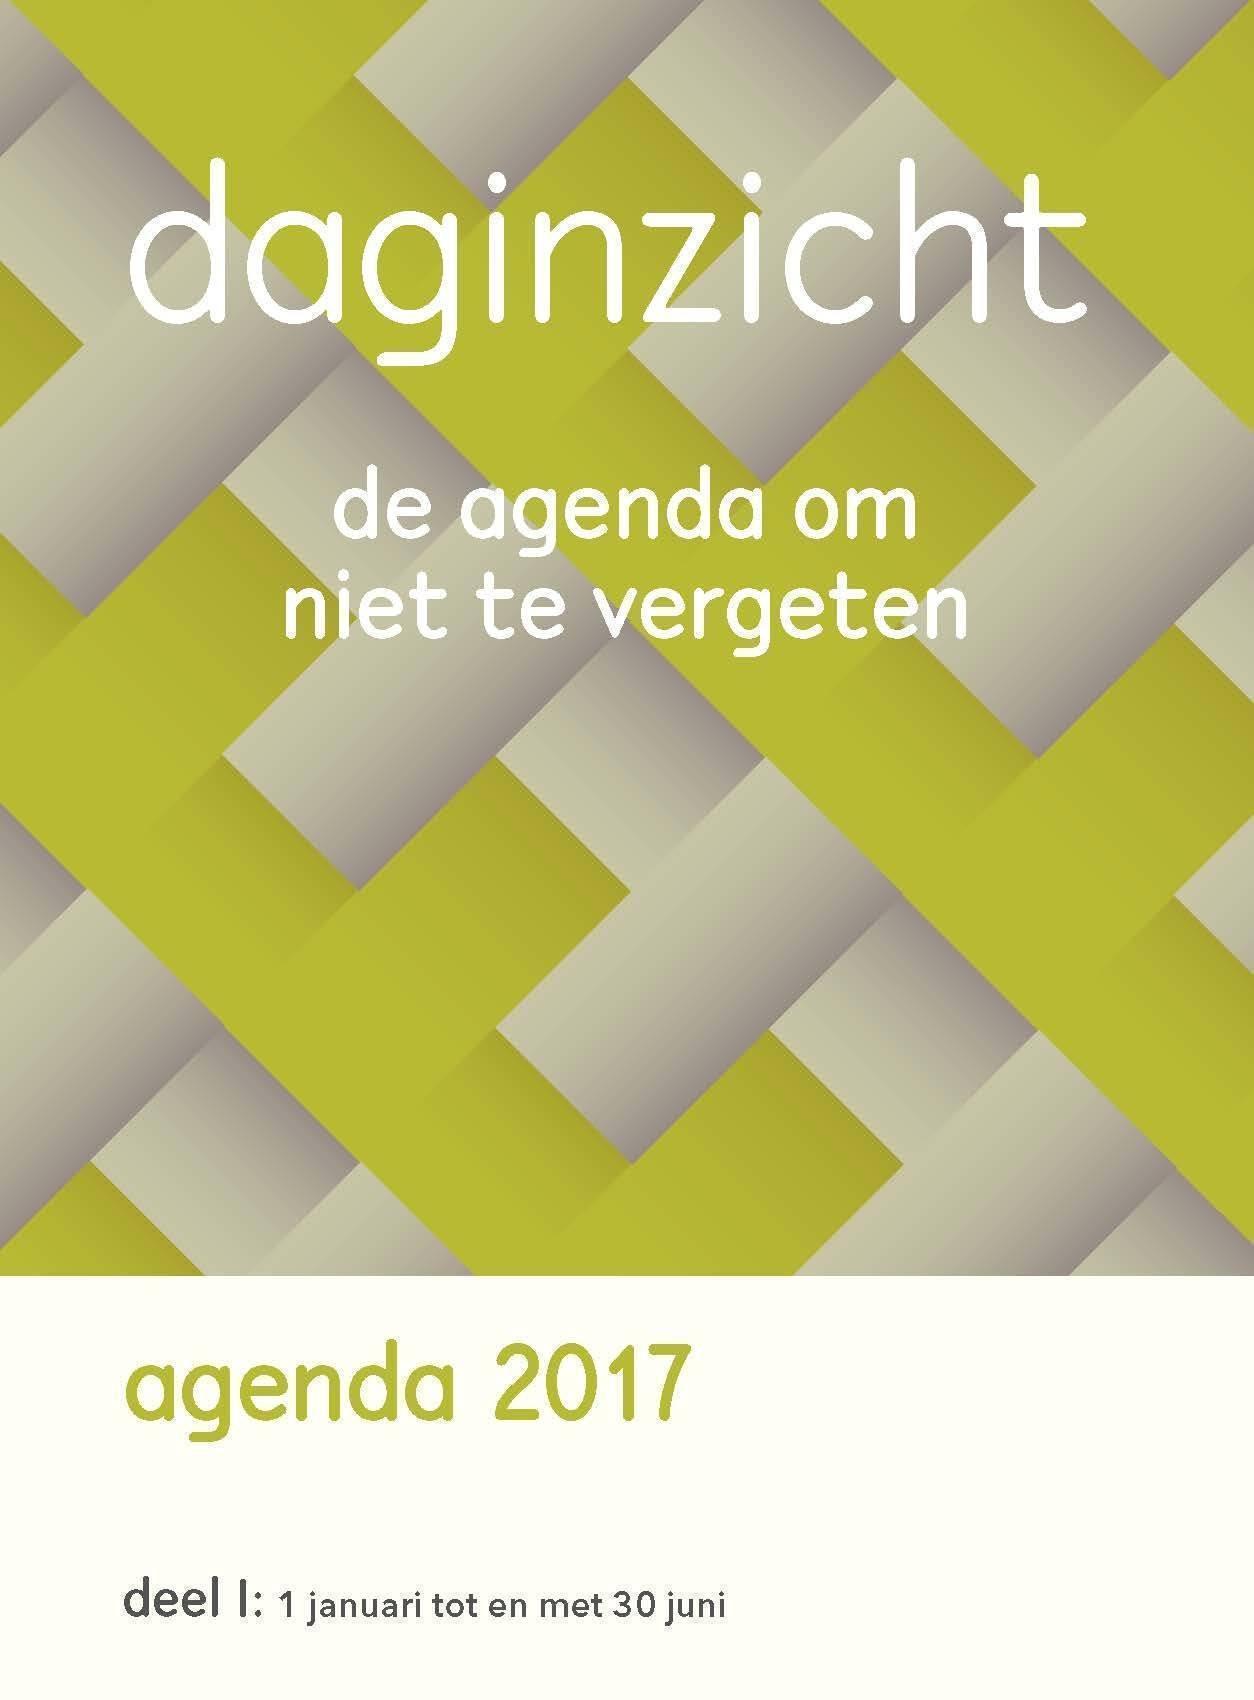 daginzicht agenda 2017